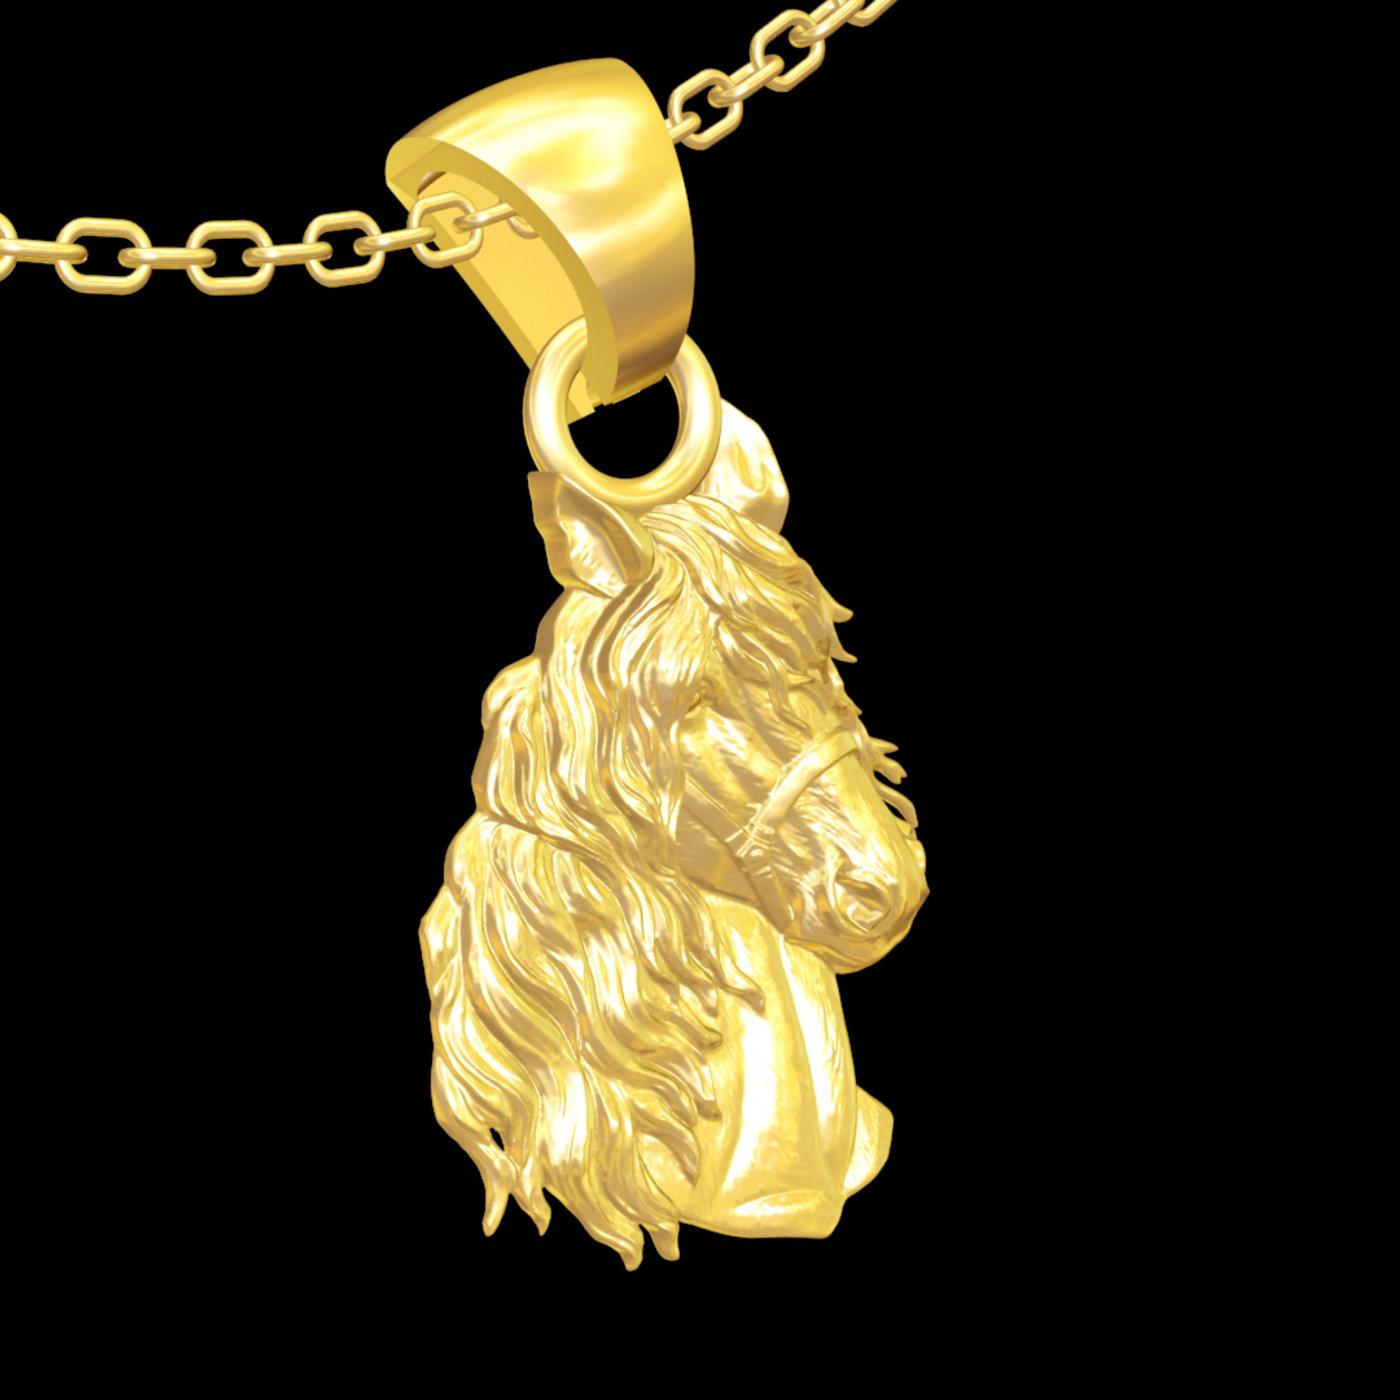 Horse Head Statue Sculpture pendant jewelry gold necklace 3D print model